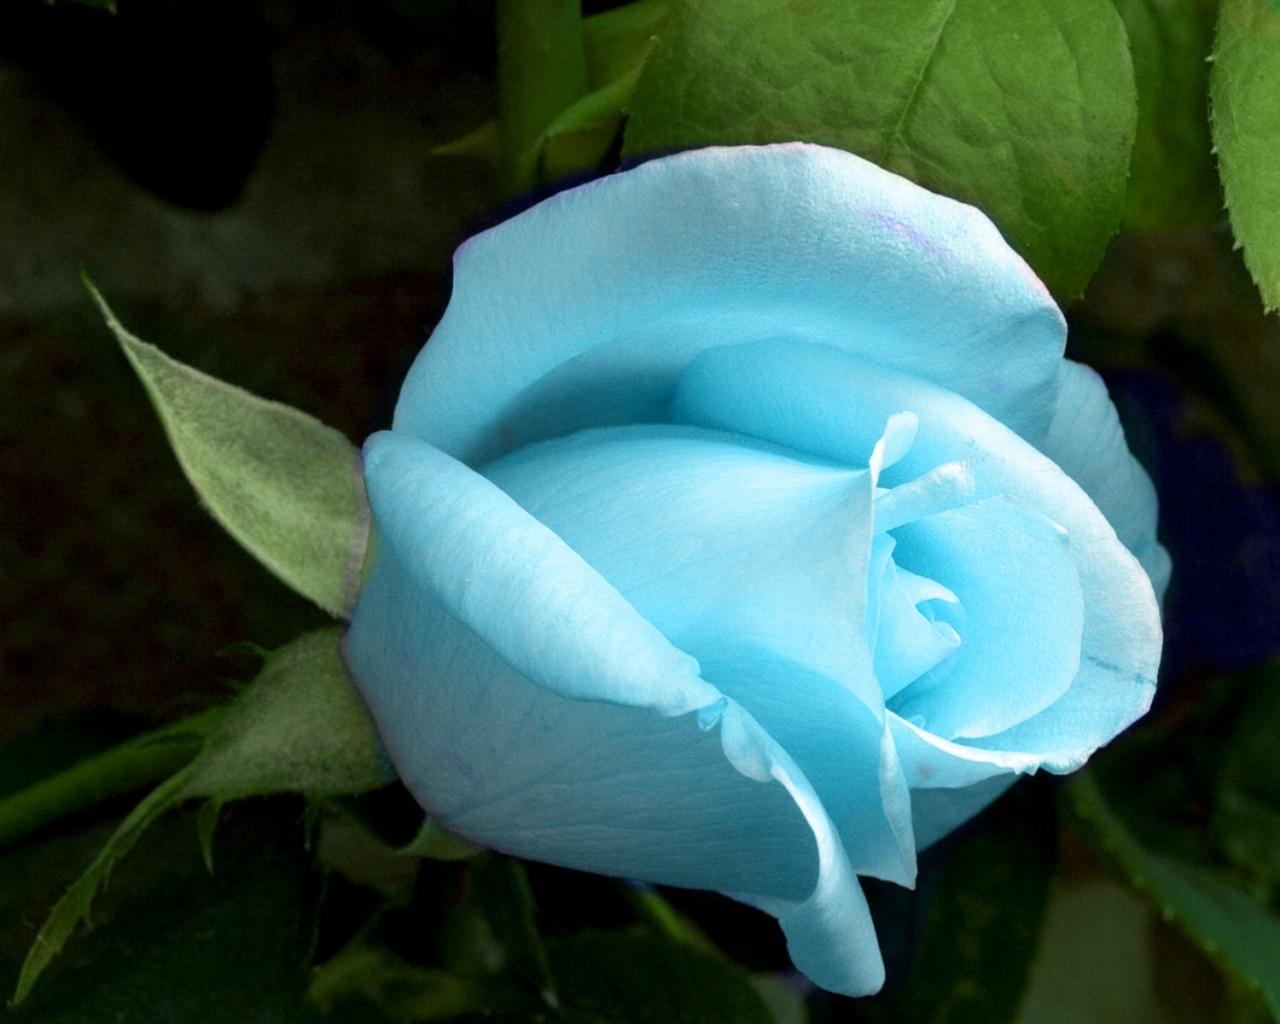 http://3.bp.blogspot.com/-bd6KgqEJ1Sc/Tg3n3DHtm0I/AAAAAAAAA6w/yVjr0lC-b90/s1600/blue_rose.jpg